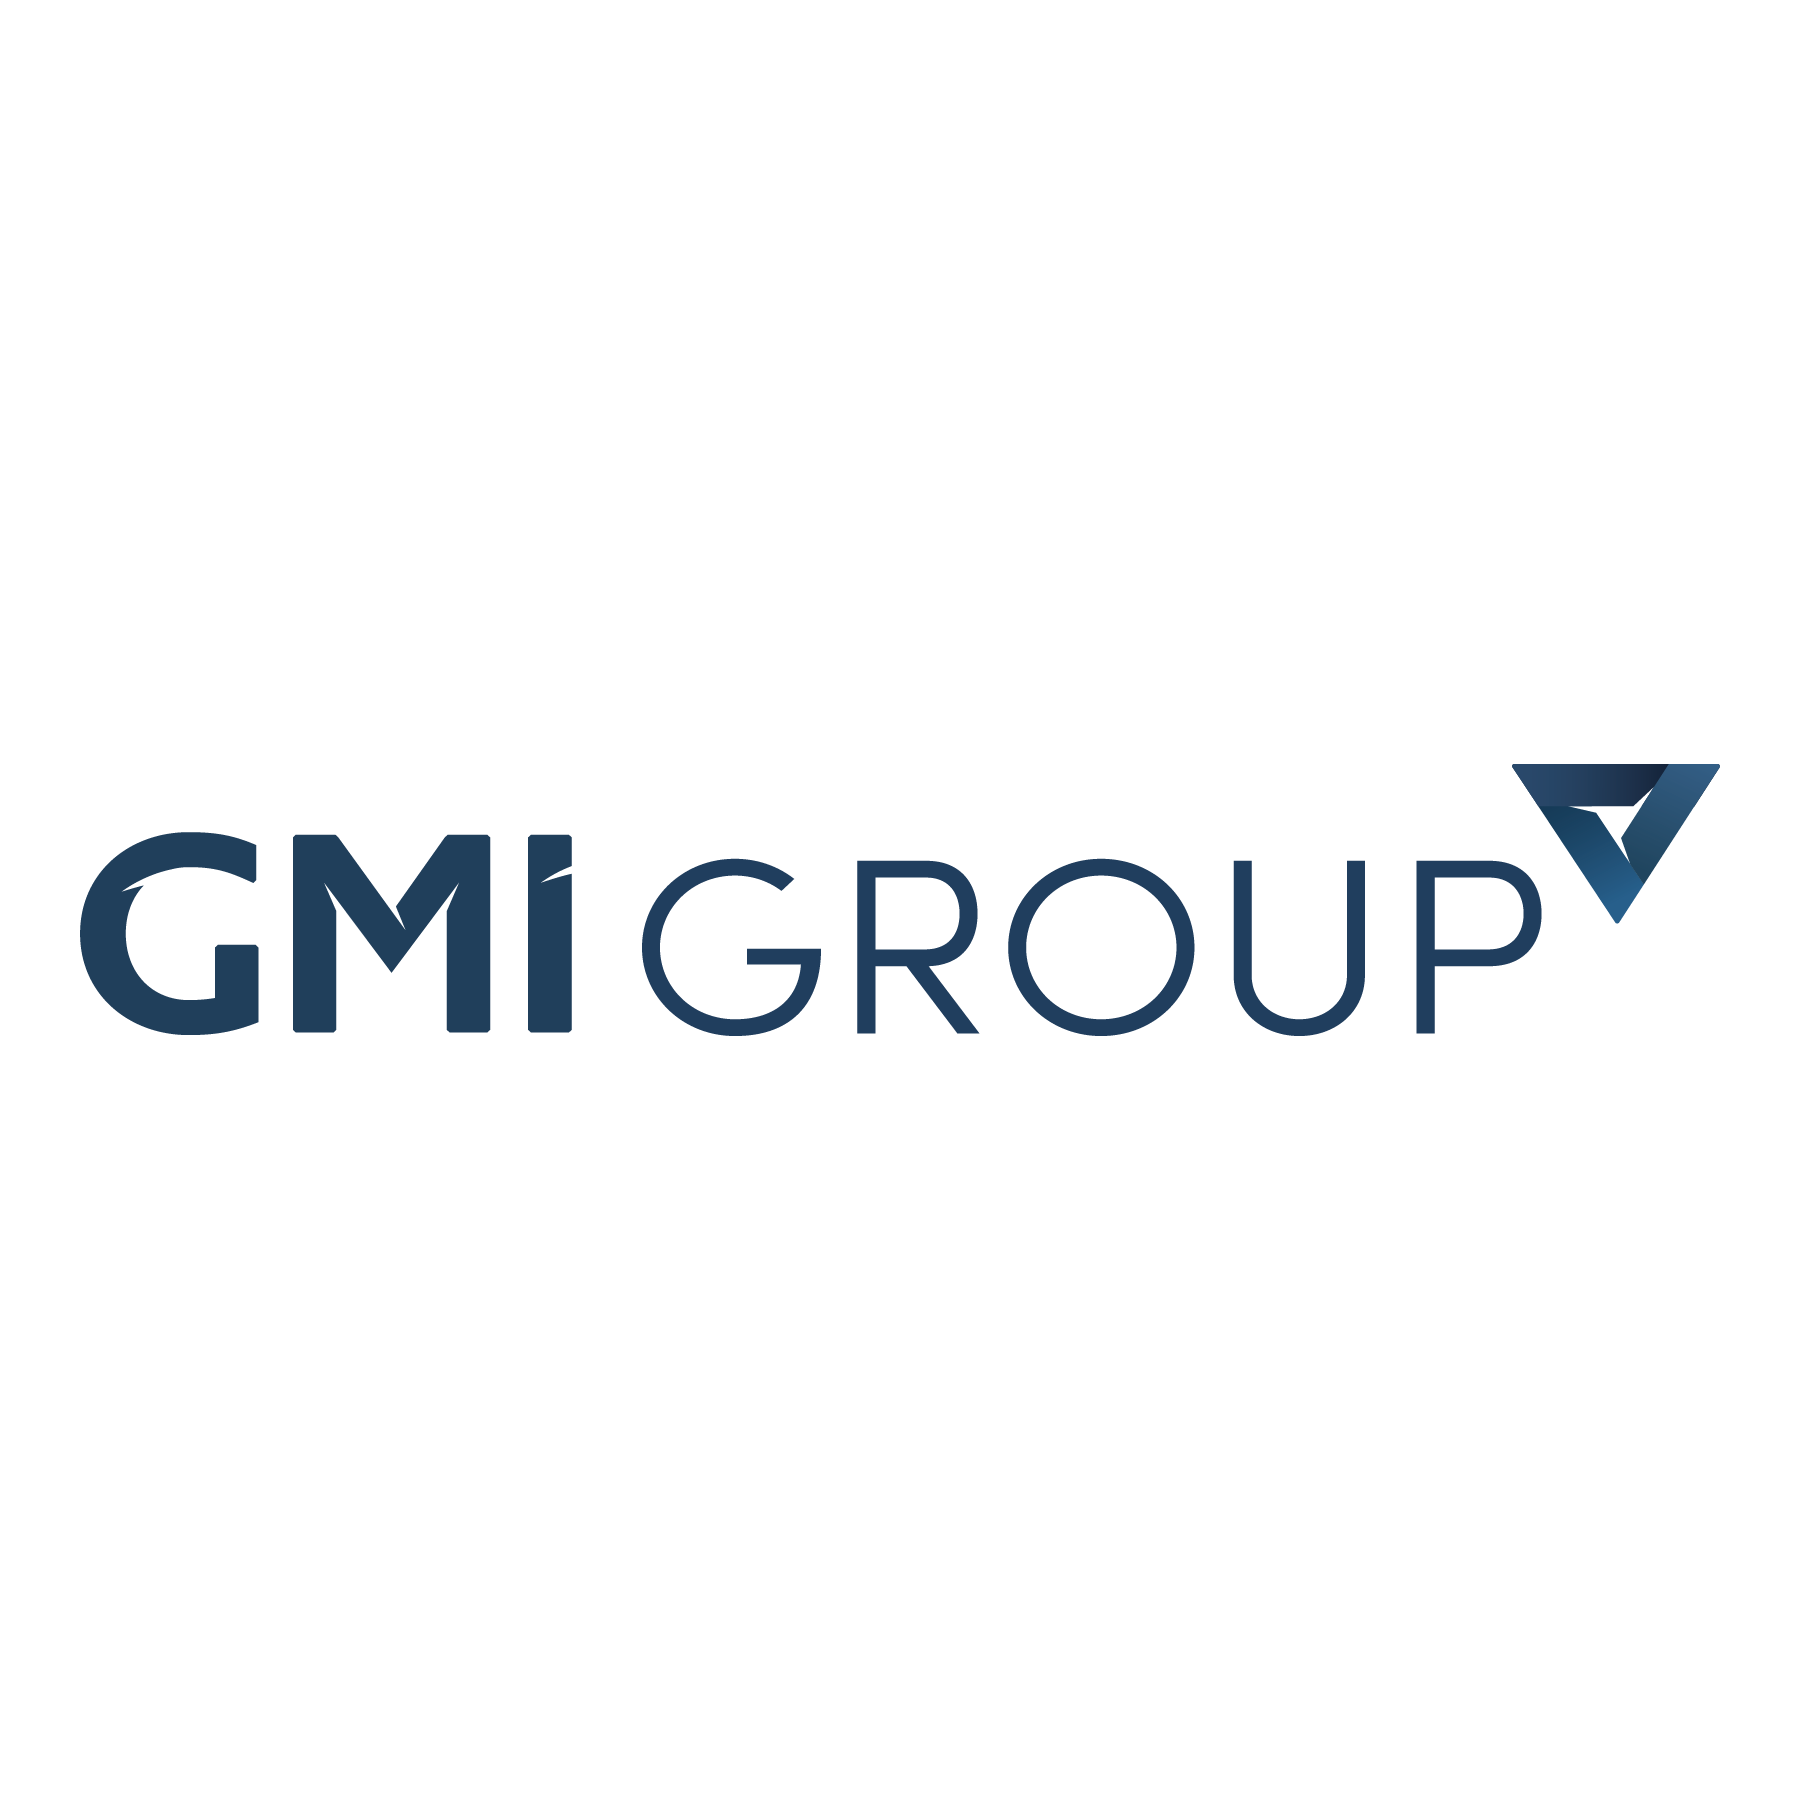 GMI Group